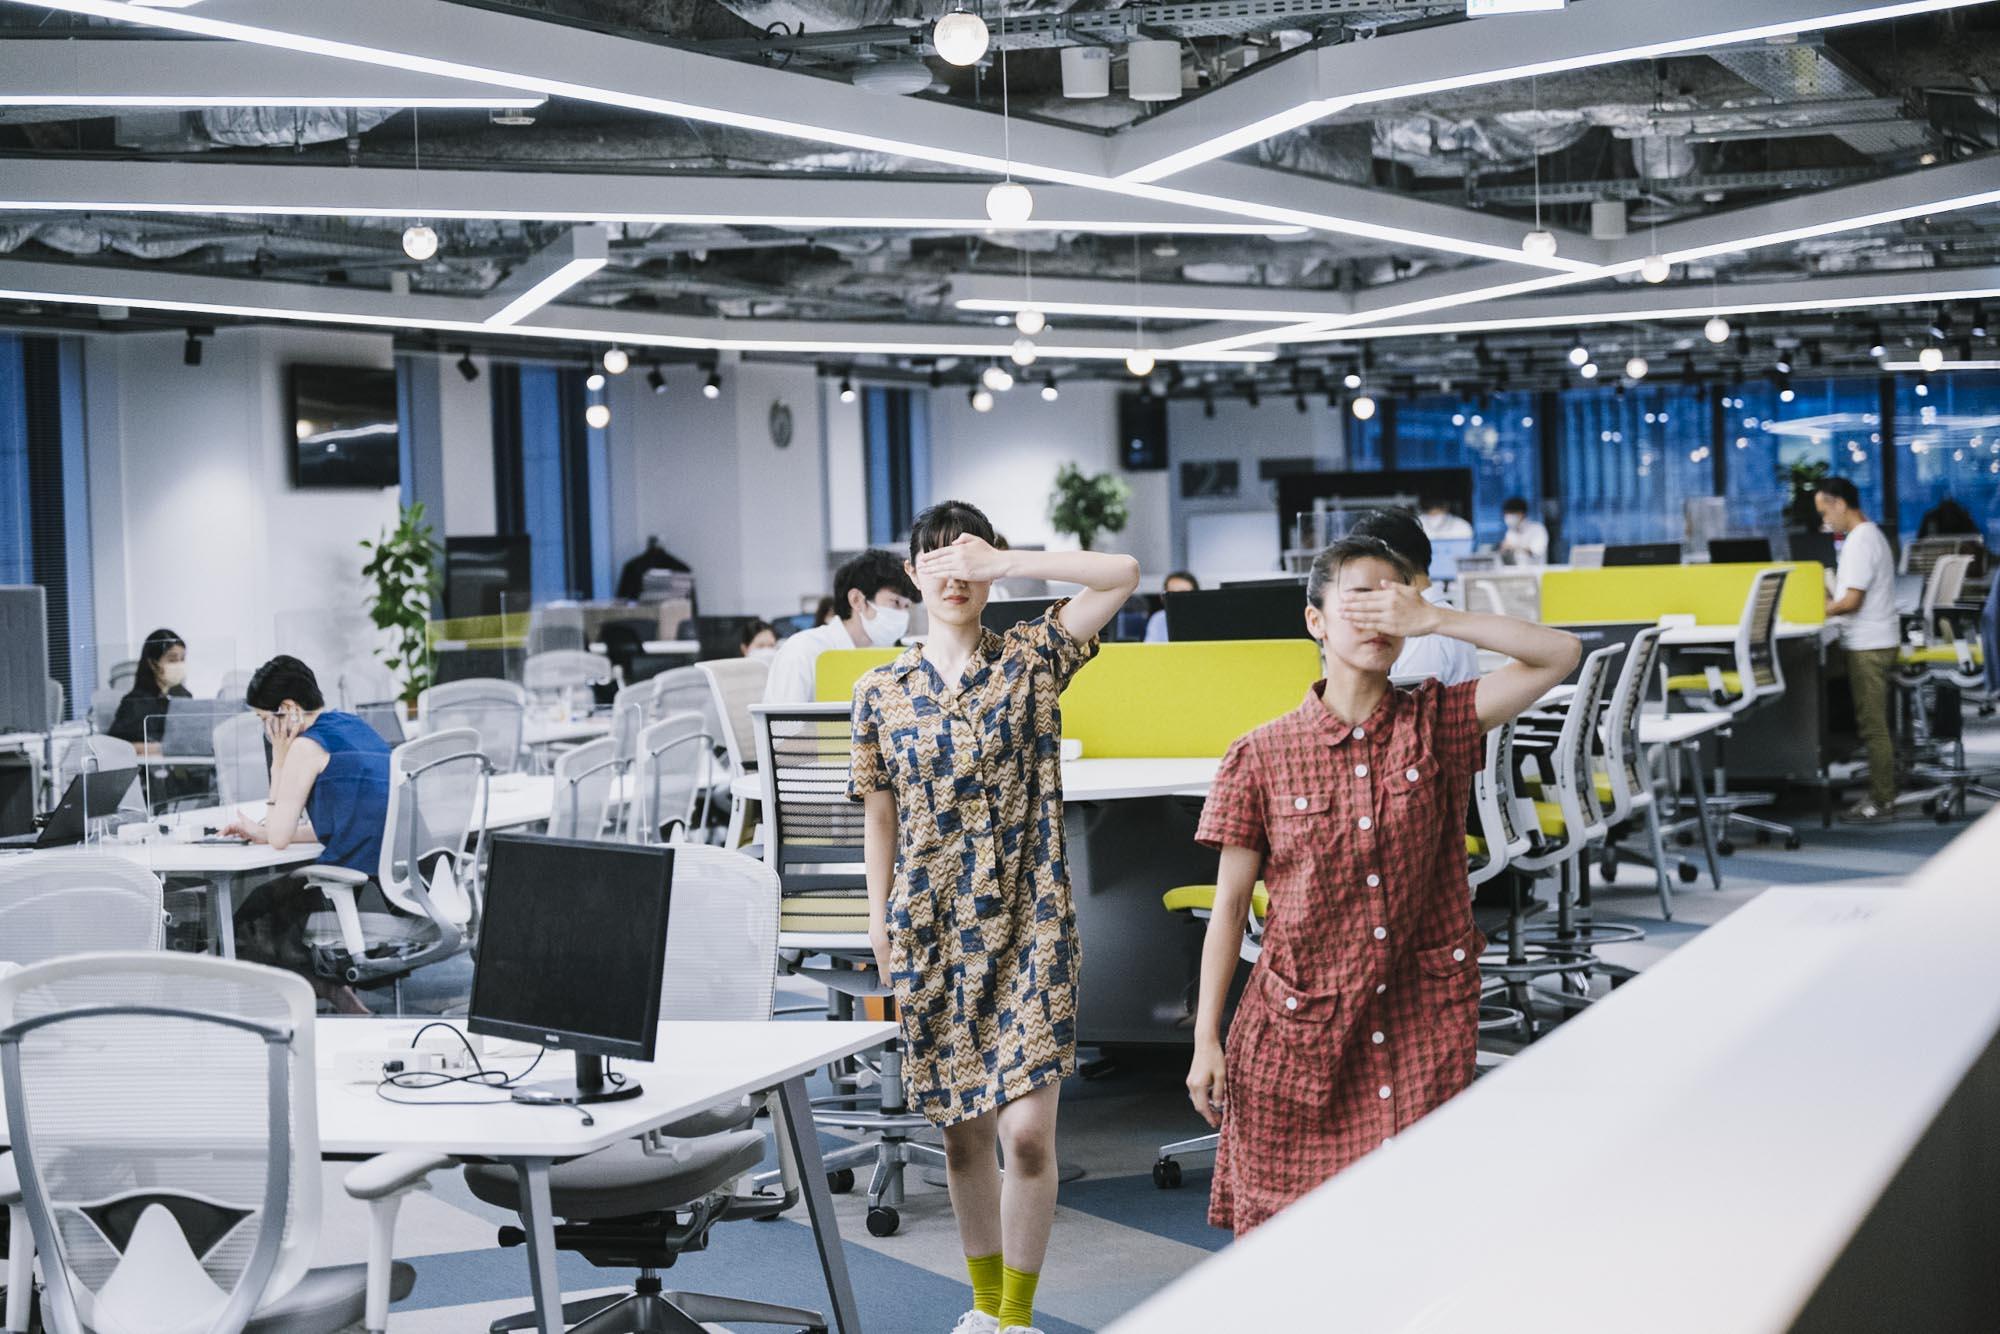 【KENTARO!! a.k.a. Dayonashiik!!】ライブパフォーマンス|語り継がれない伝説 by 東京ビエンナーレ